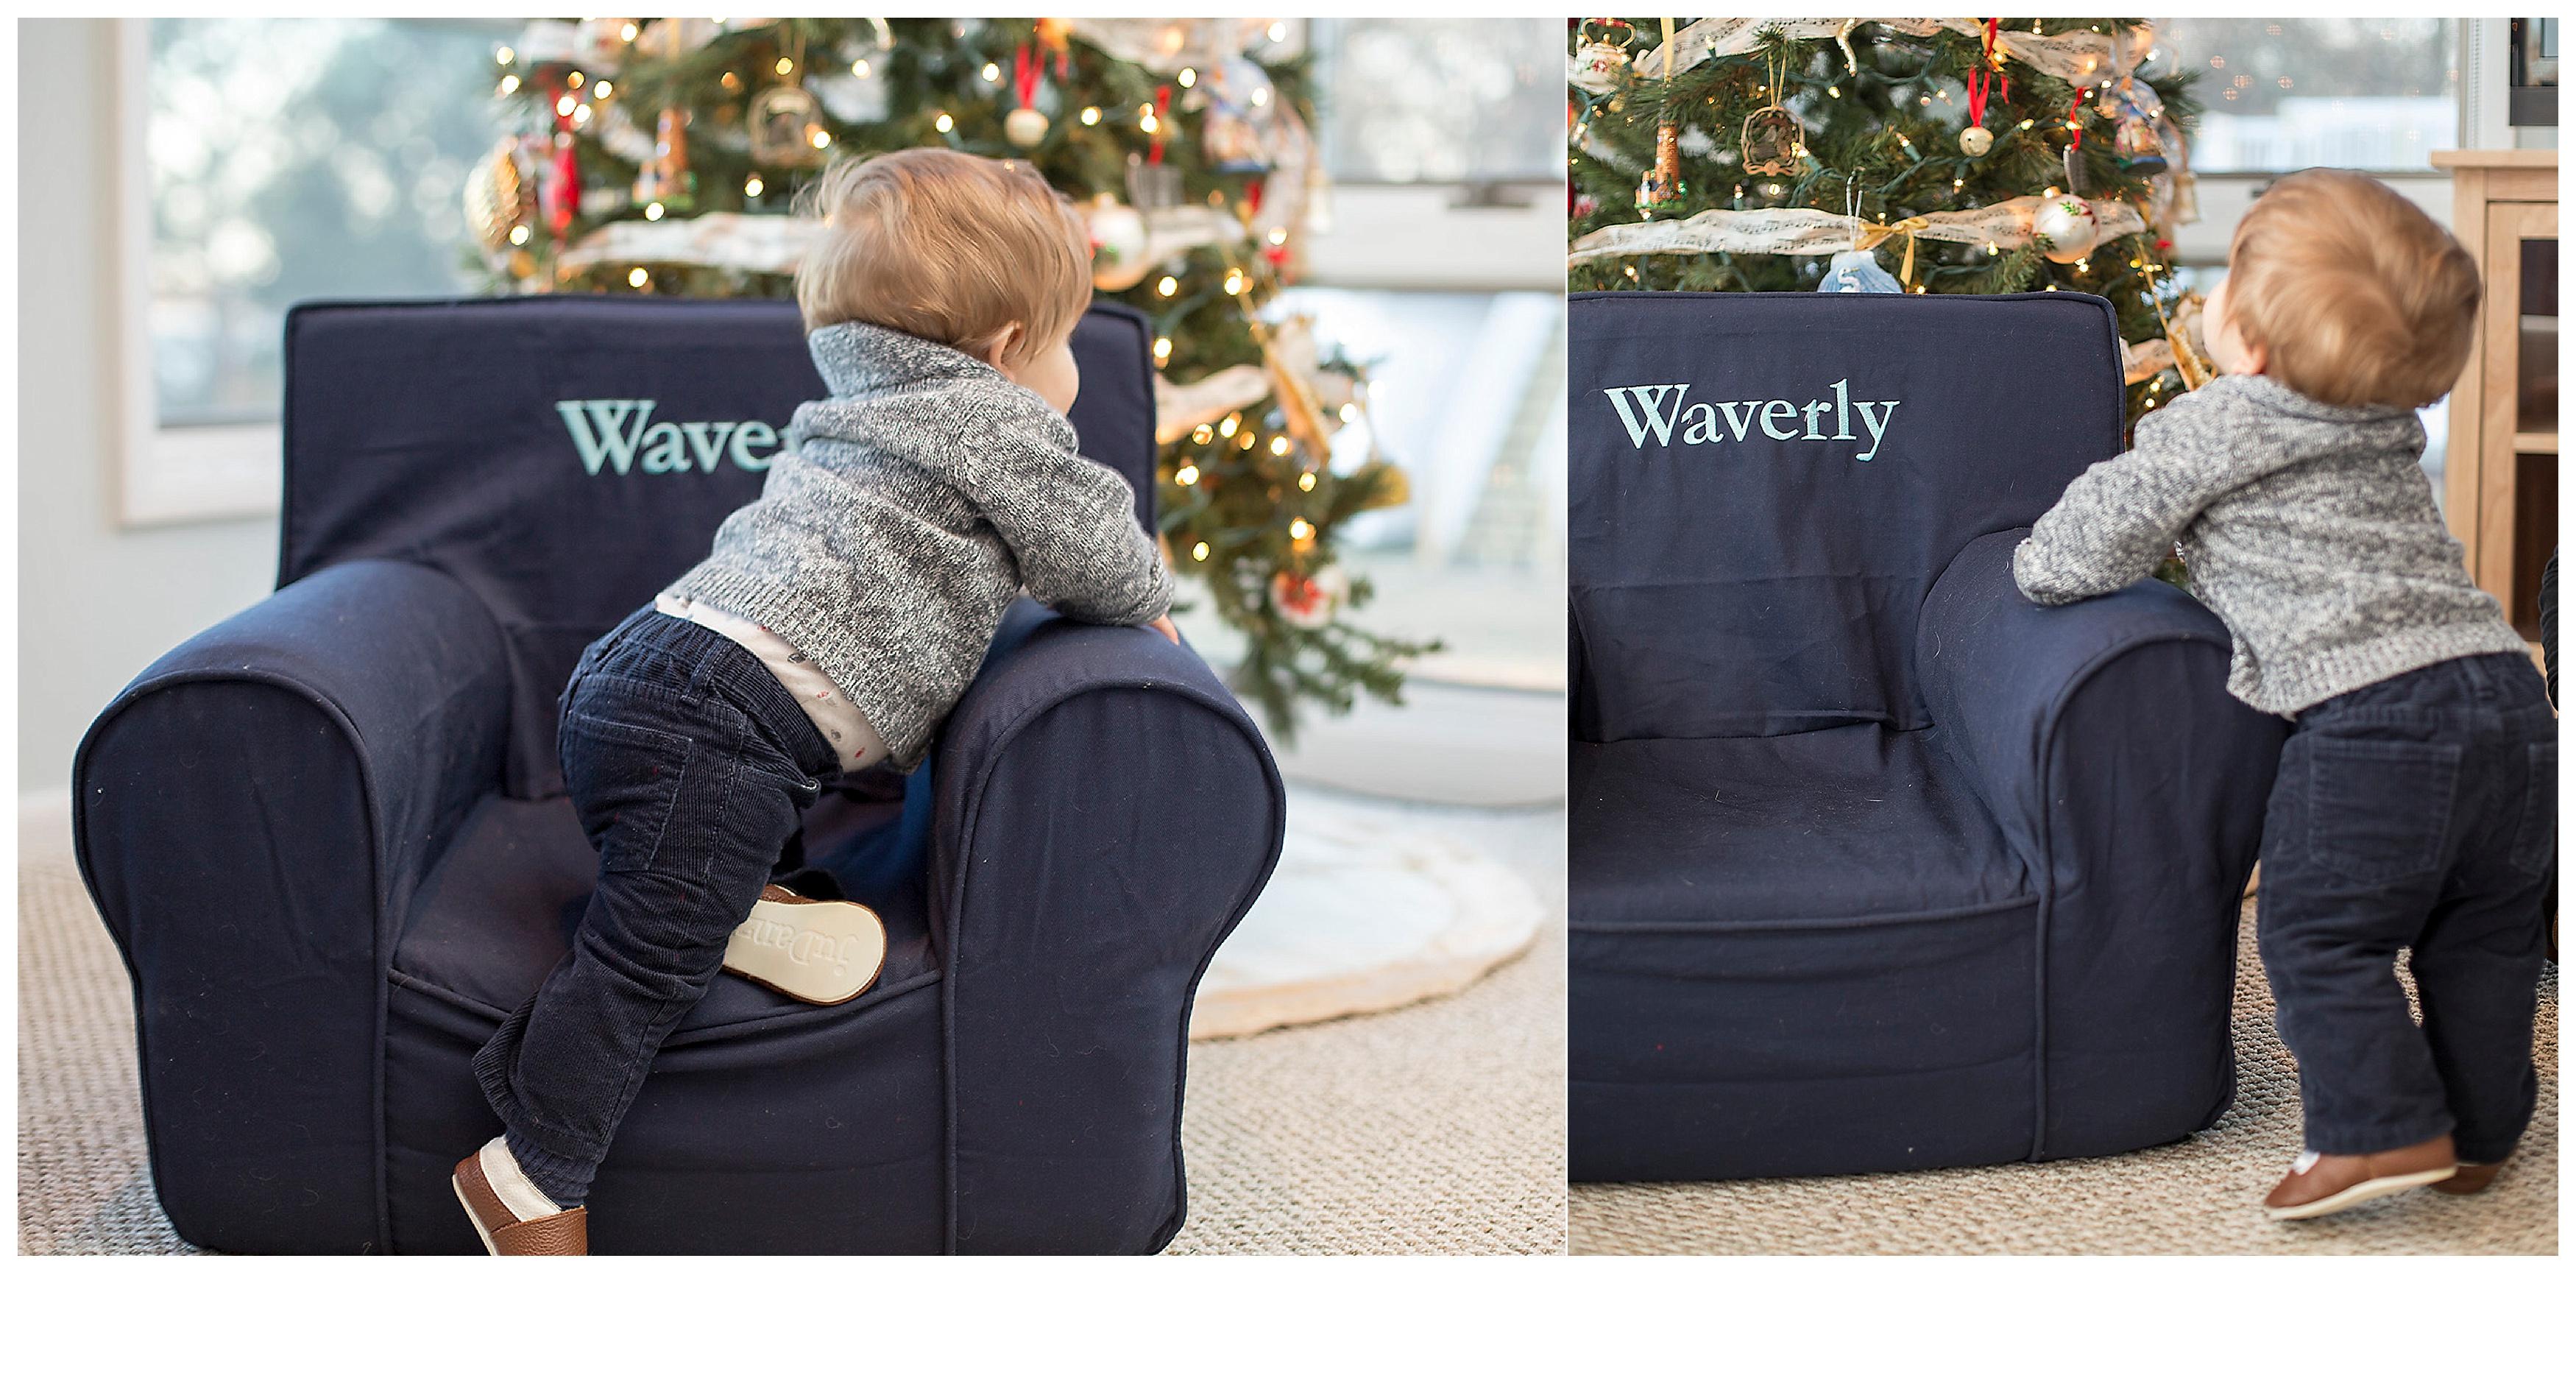 Waverly_92.jpg